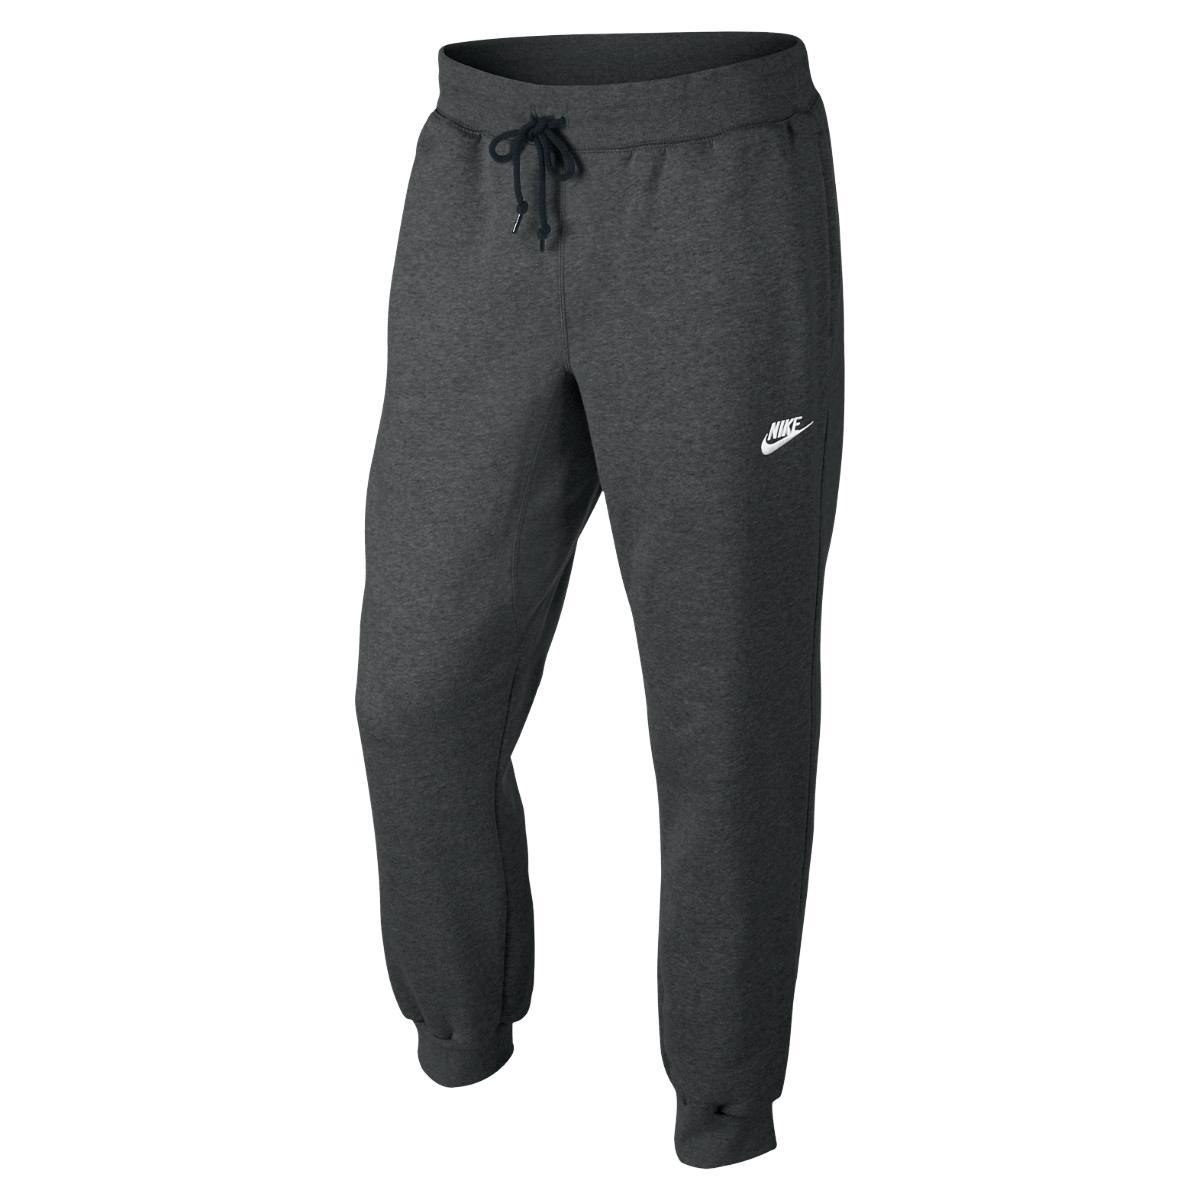 Nike-AW77-Fleece-Pant-Herren-Hose-Jogginghose-Sporthose-diverse-Farben